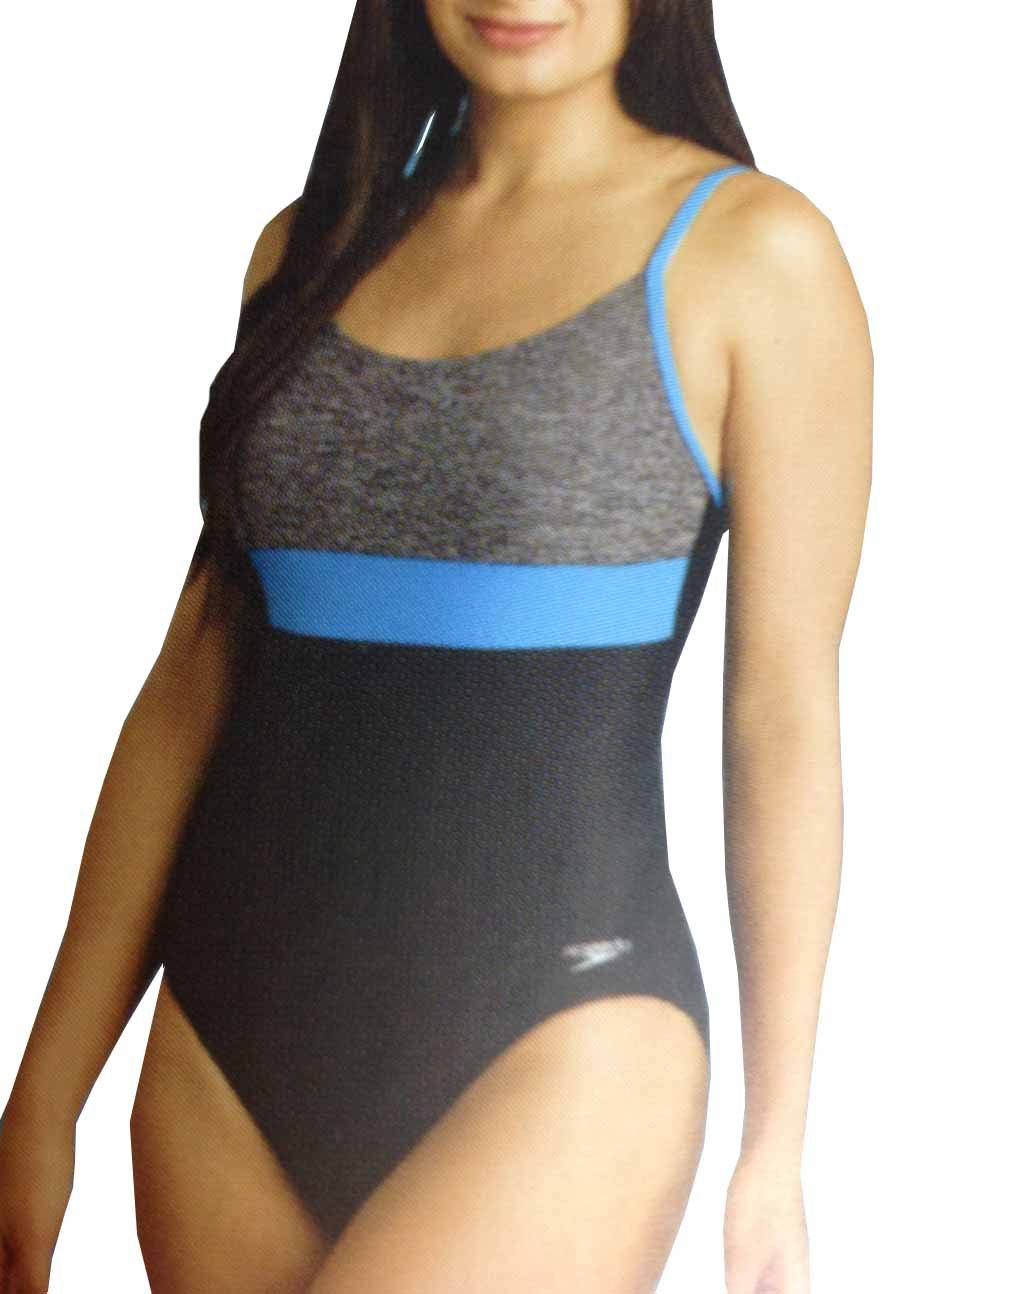 Speedo Women's Ultraback Racerback Athletic Training One Piece Swimsuit (Heather Grey, 16)